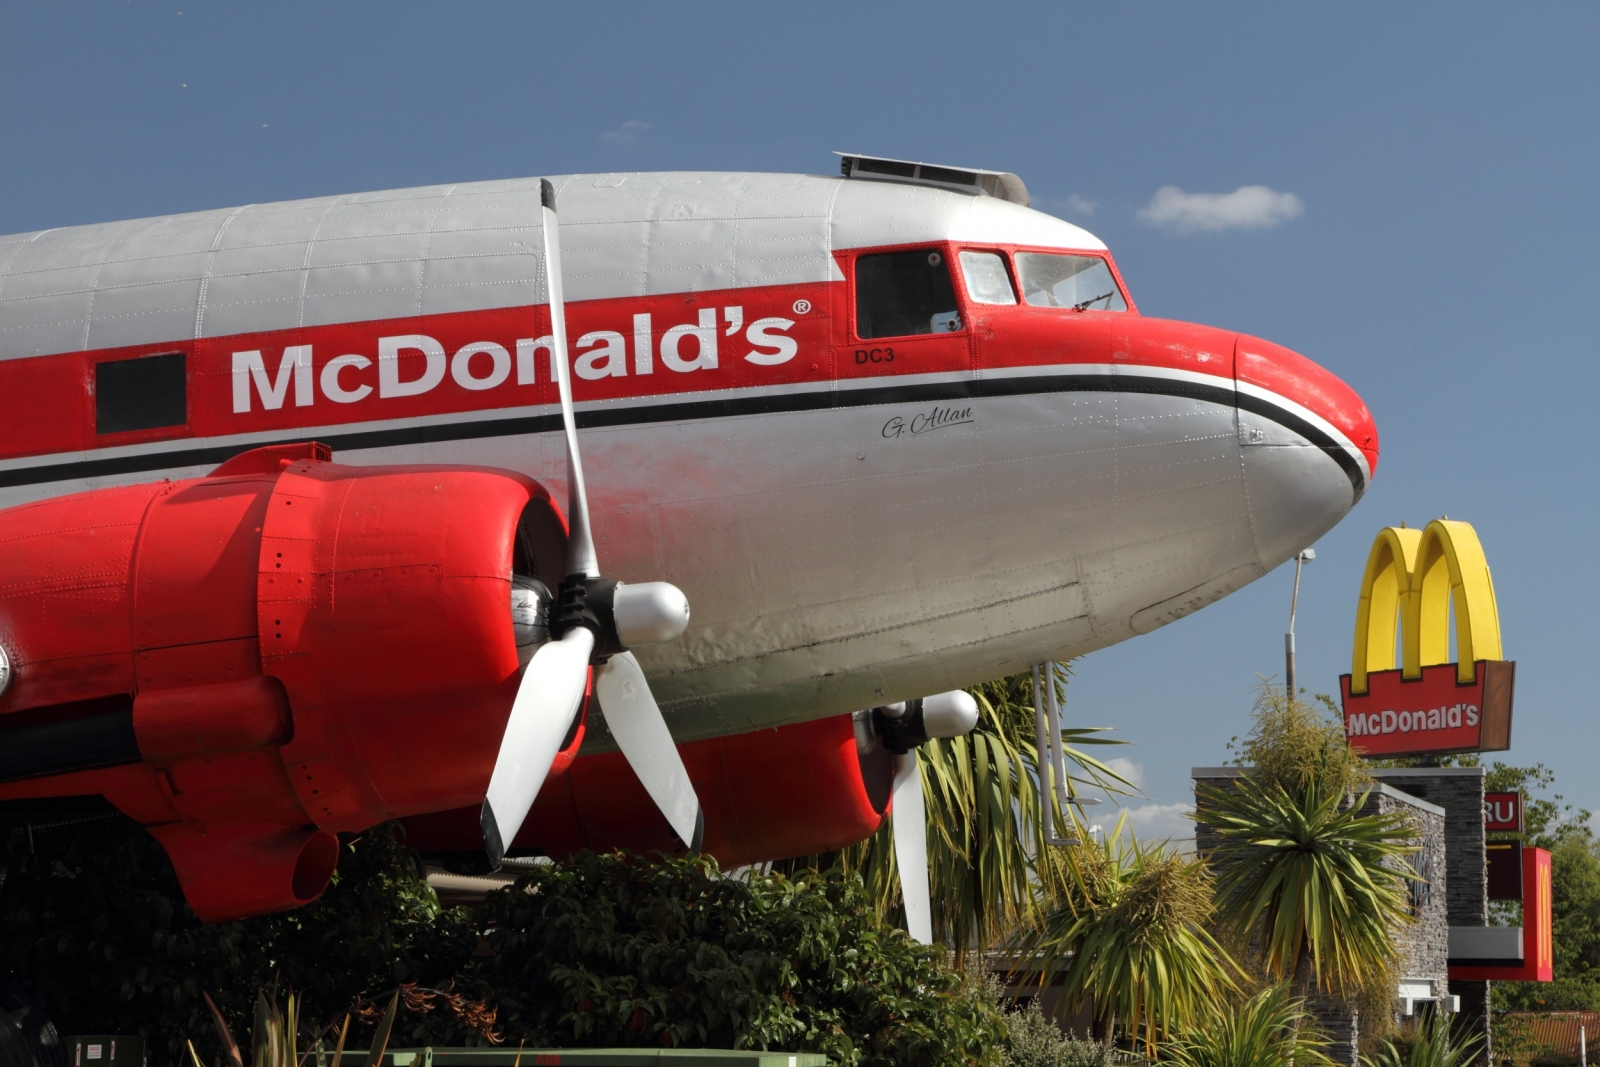 McDonald's plane